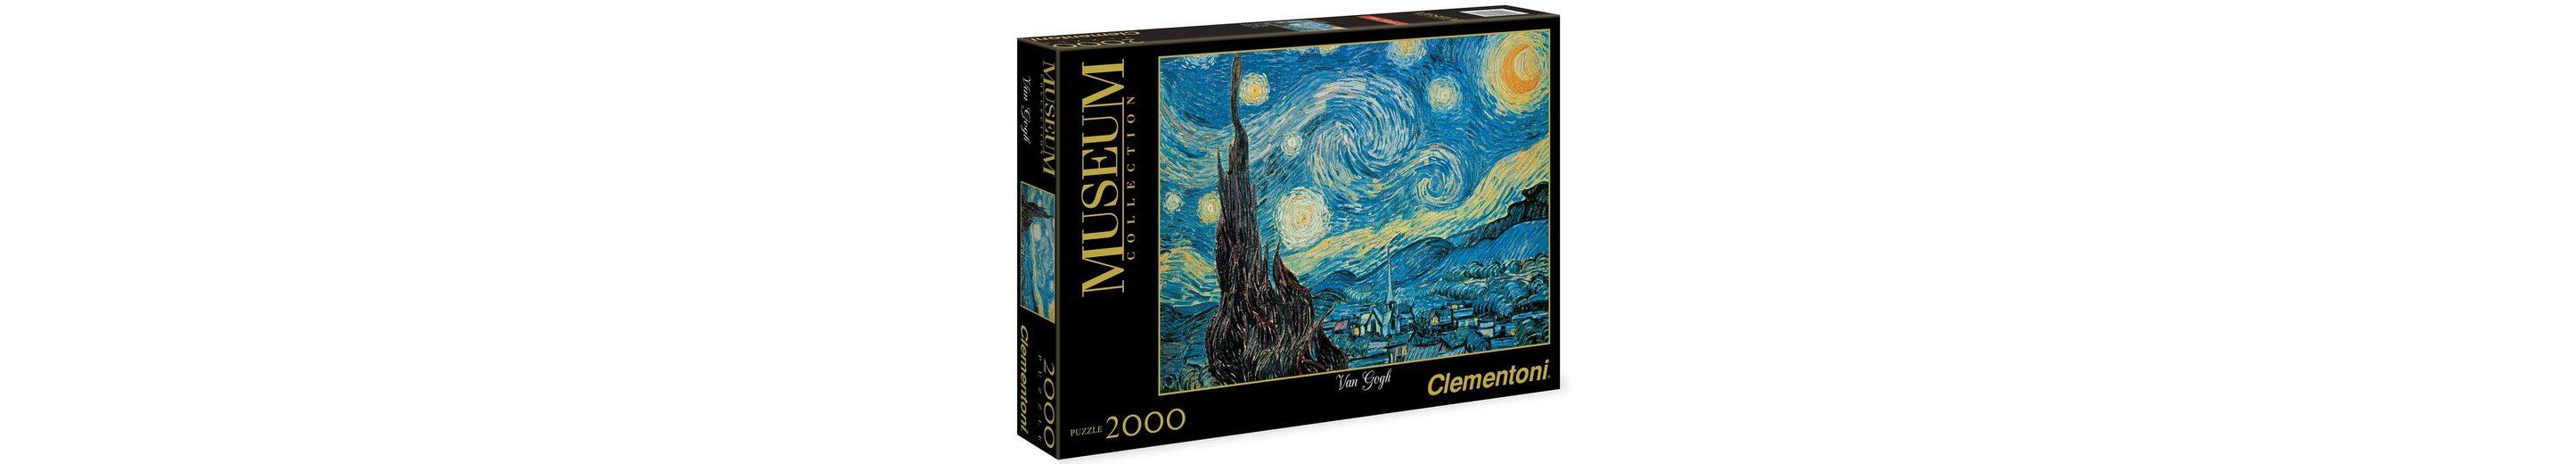 Clementoni Puzzle, 2000 Teile, »Van Gogh - Sternennacht«